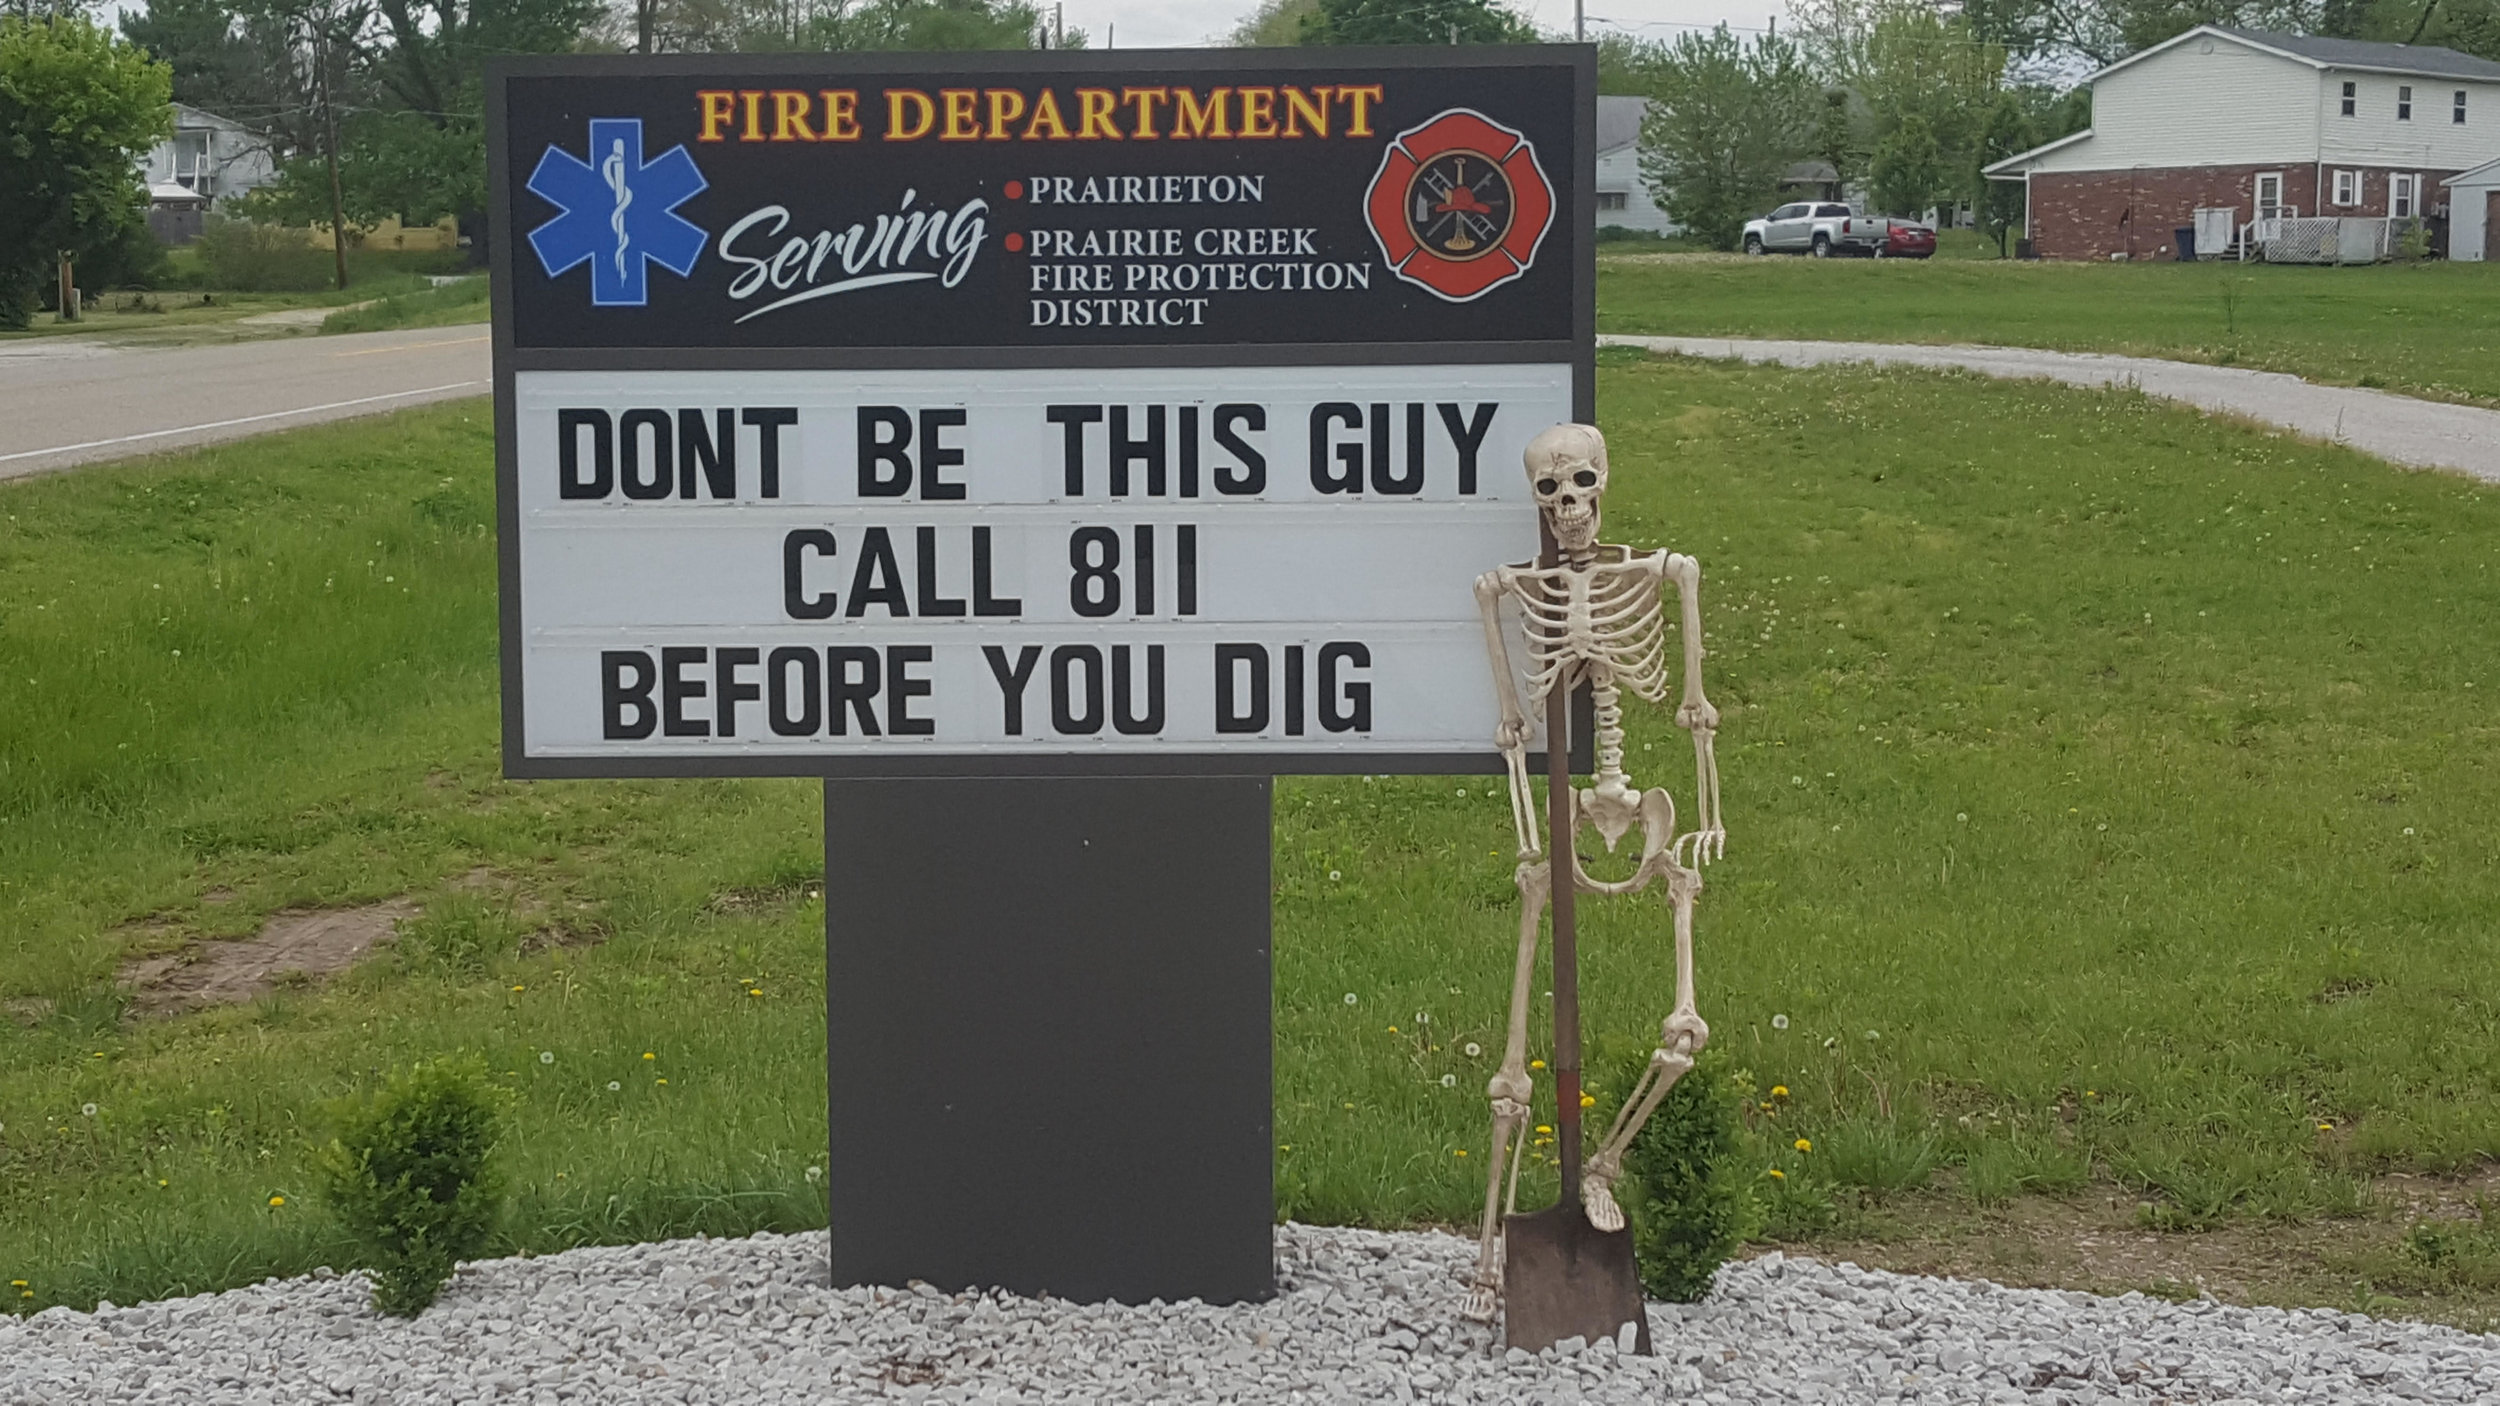 Prairieton Fire Department